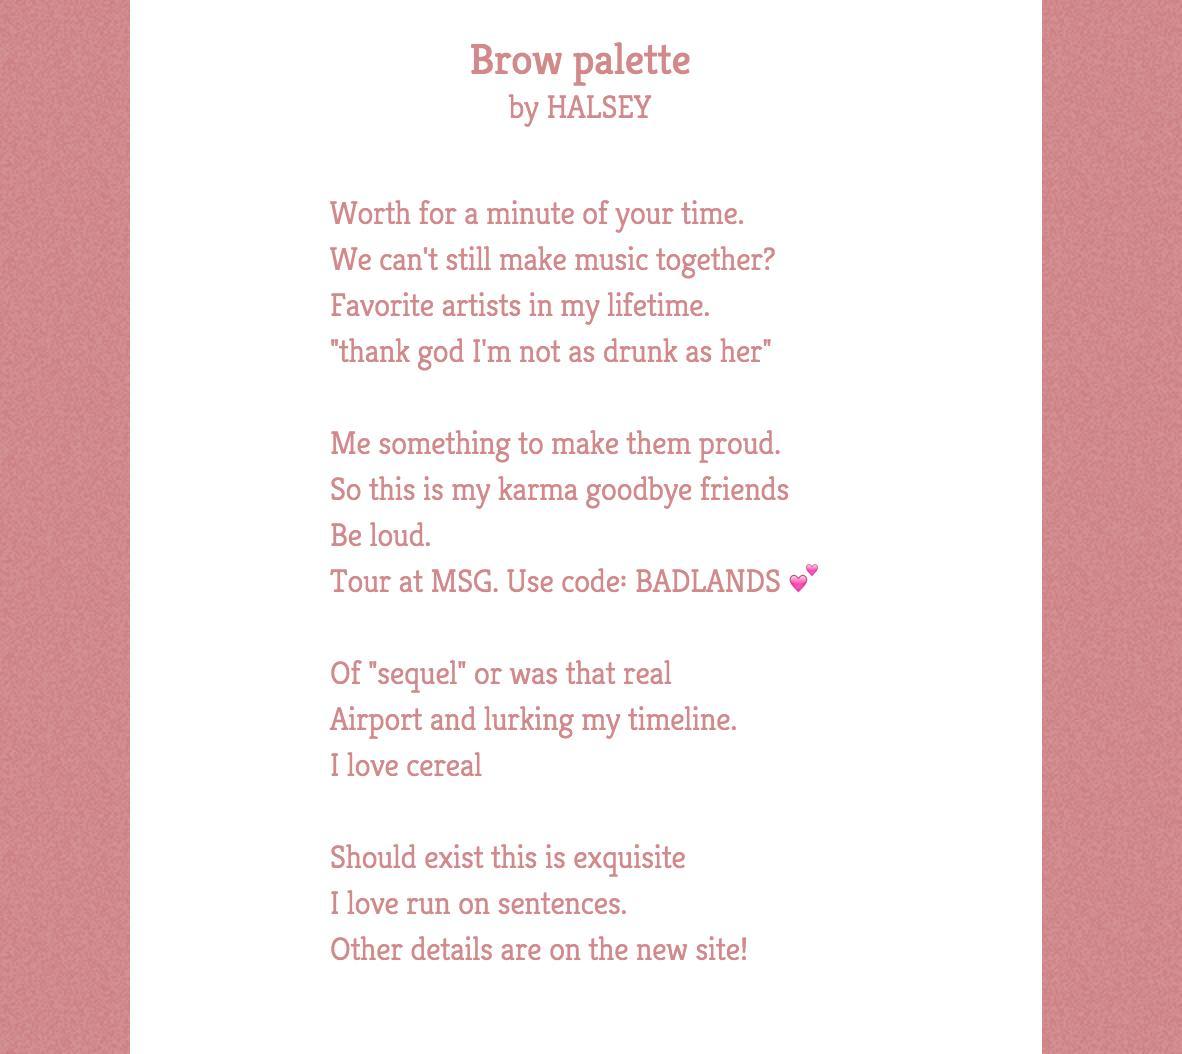 halsey poem